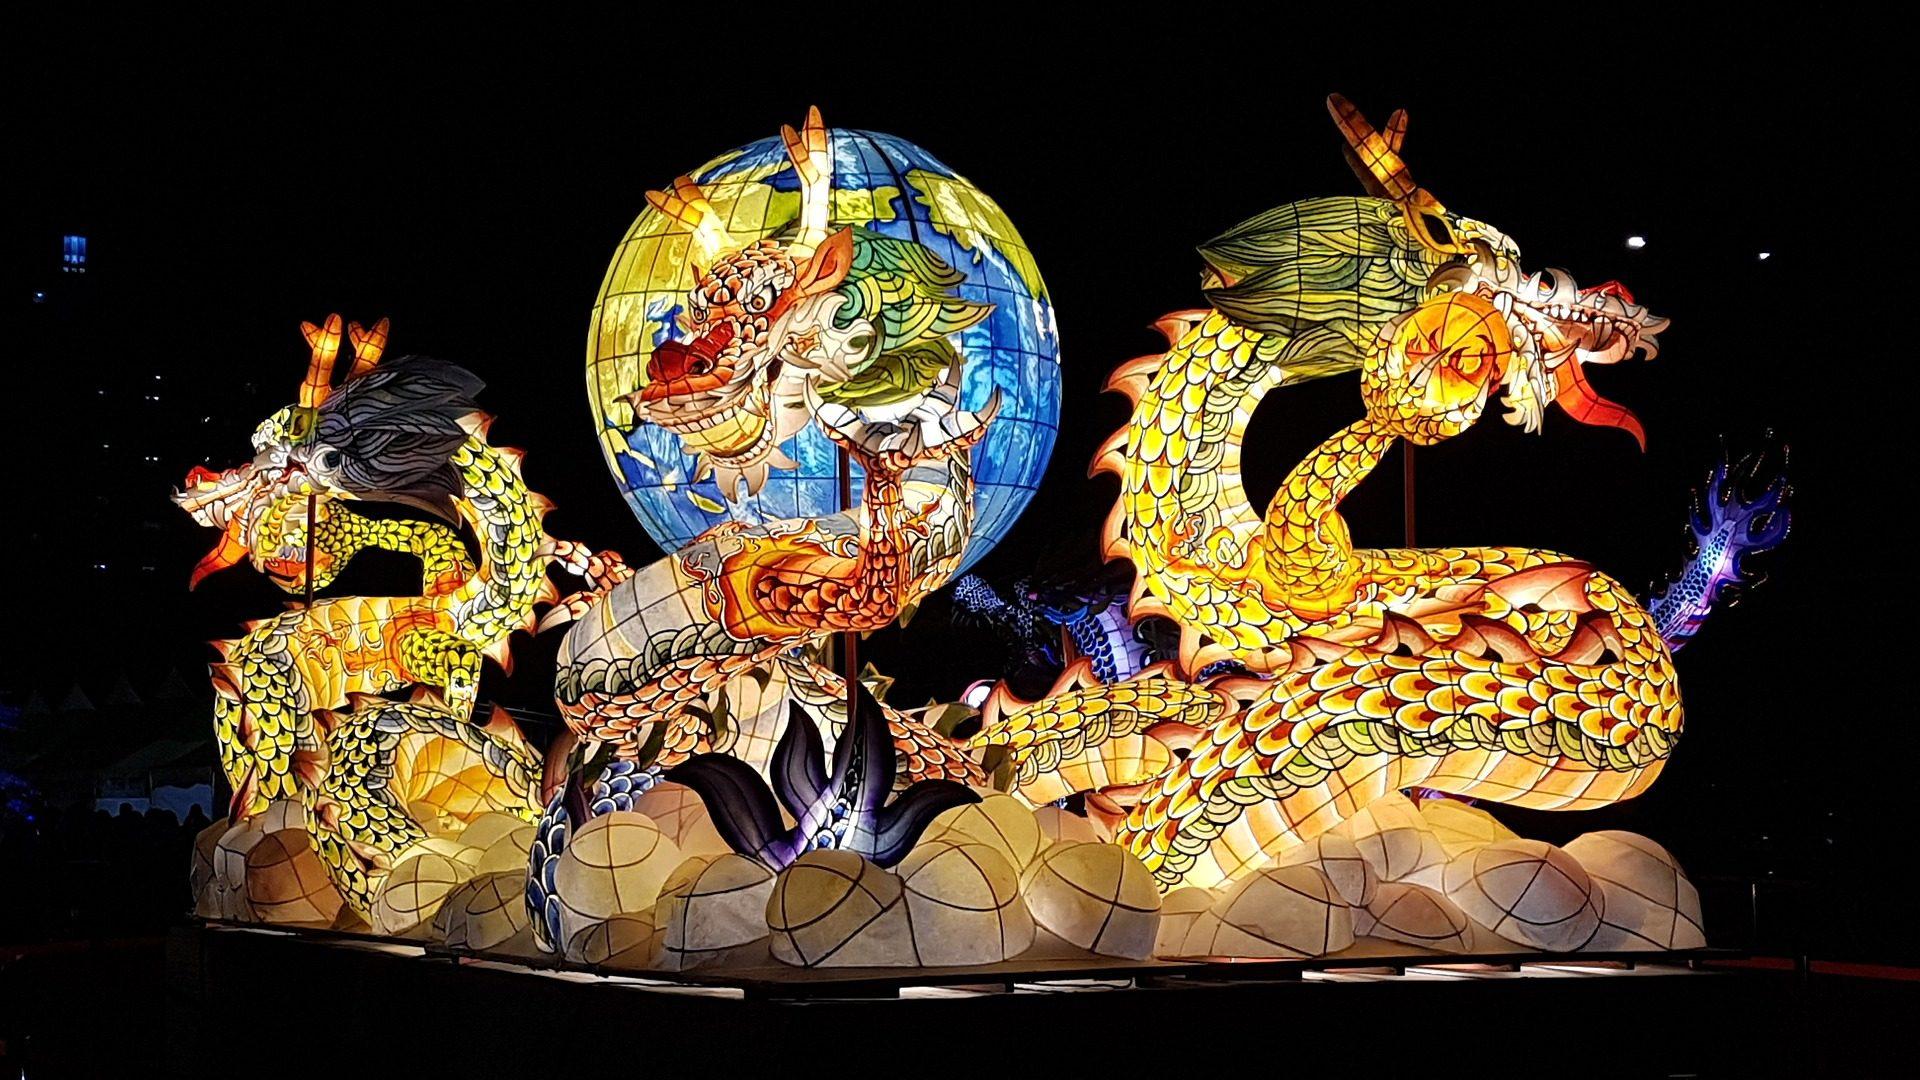 dragones, λάμπα, πολύχρωμο, φώτα, νύχτα - Wallpapers HD - Professor-falken.com